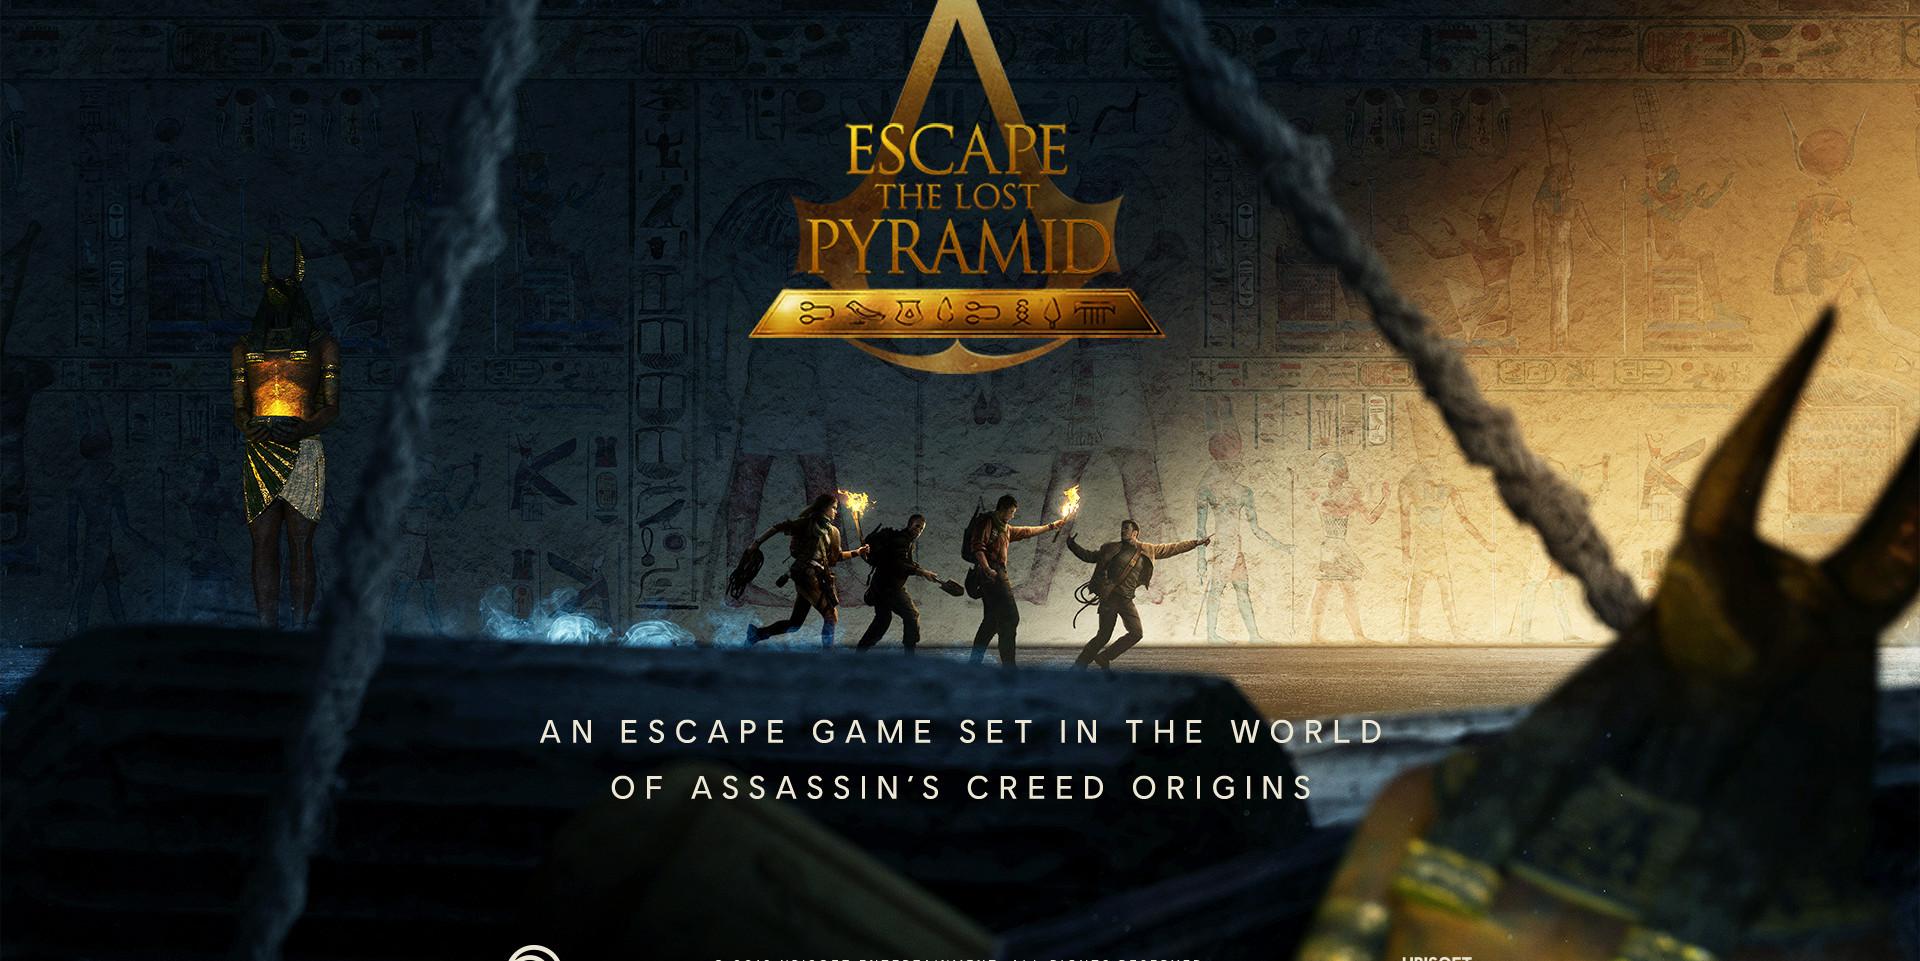 ASSASSINS CREED ESCAPE GAME